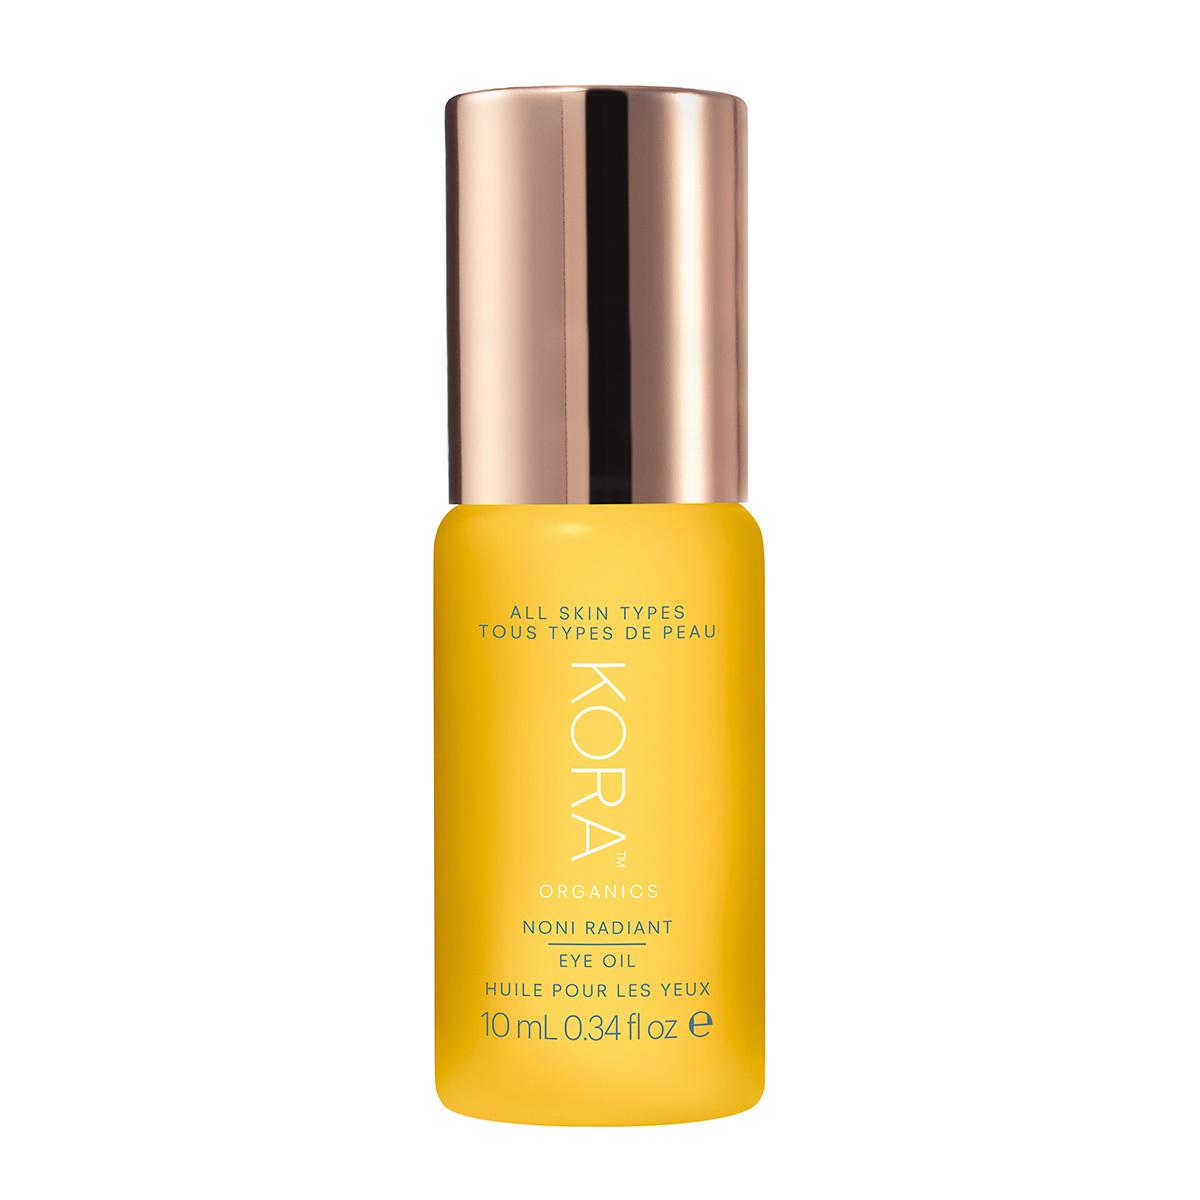 Noni Radiant Eye Oil de Kora Organics. A la venta exclusiva en...